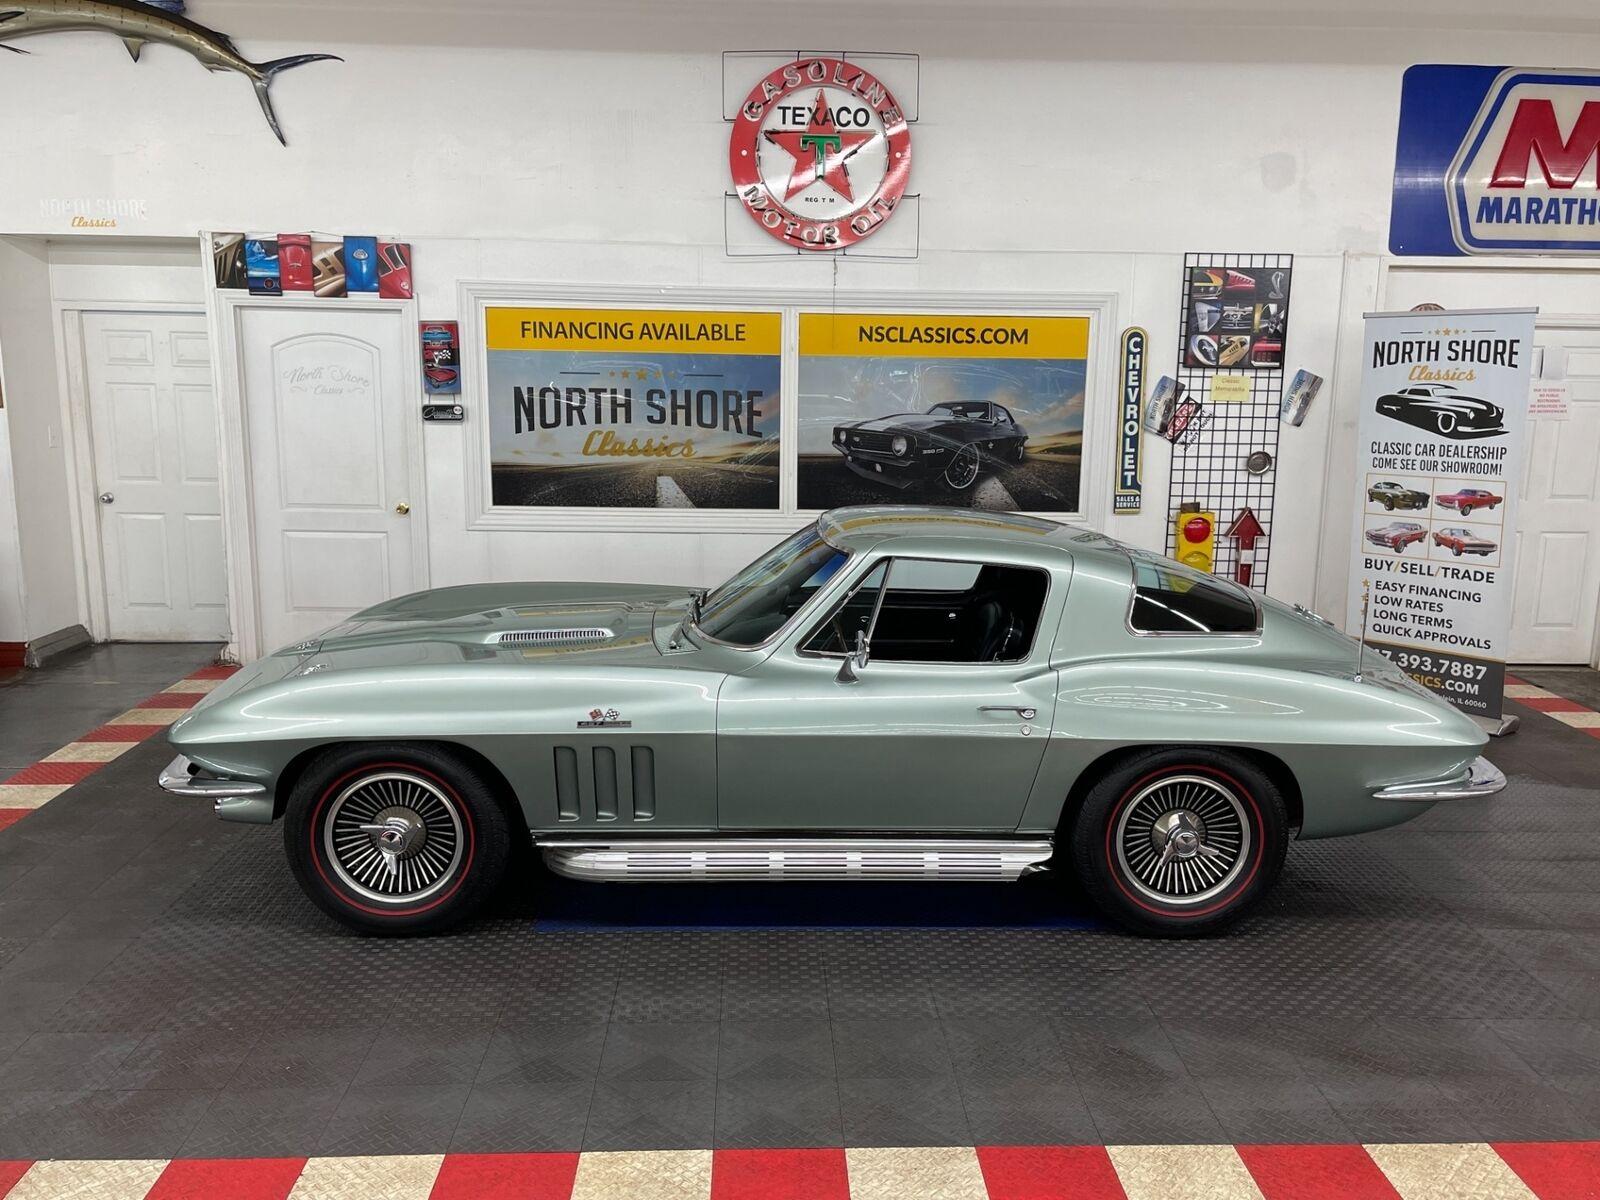 1966 Green Chevrolet Corvette Coupe  | C2 Corvette Photo 4